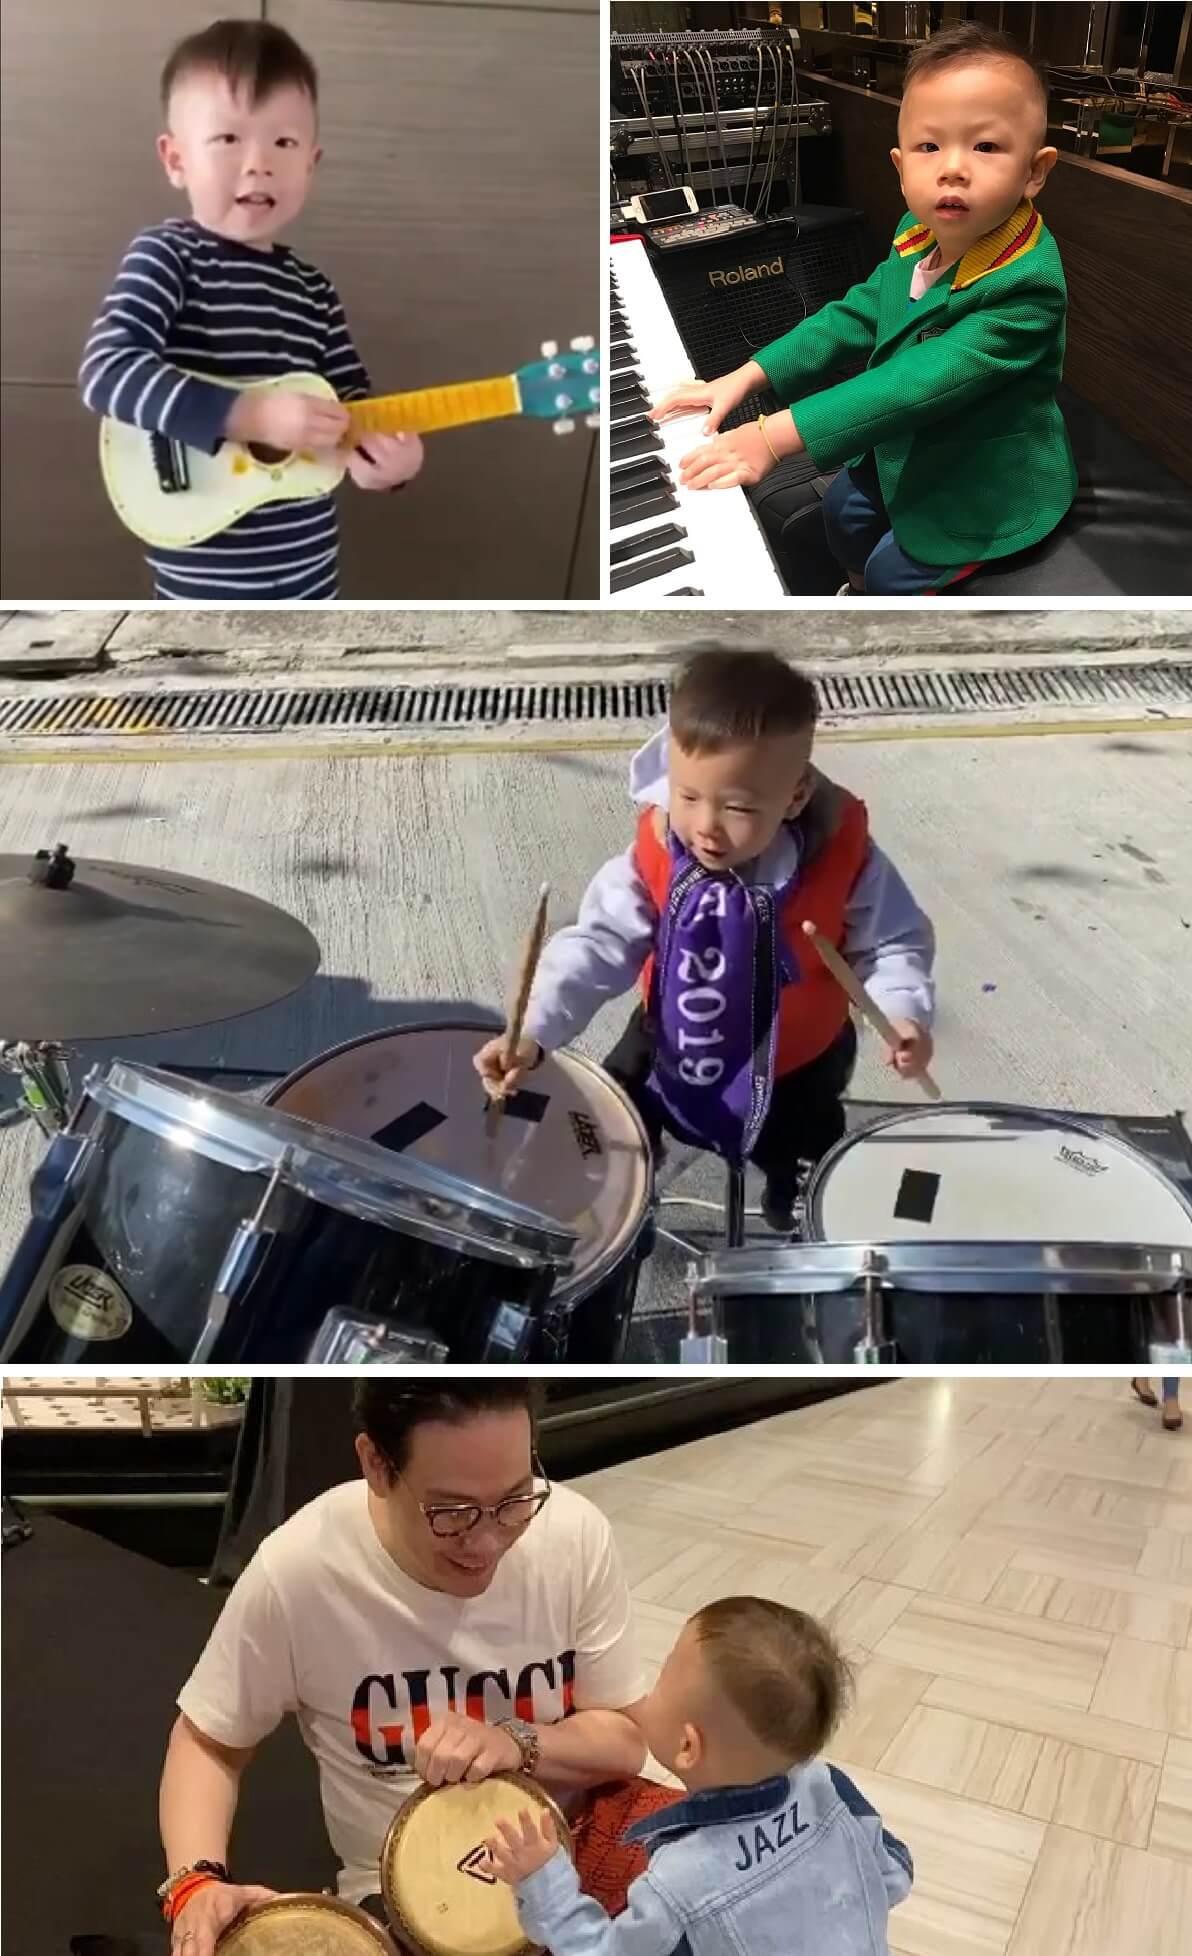 Jazz三歲人仔就識玩各樣樂器,音樂潛力無限。